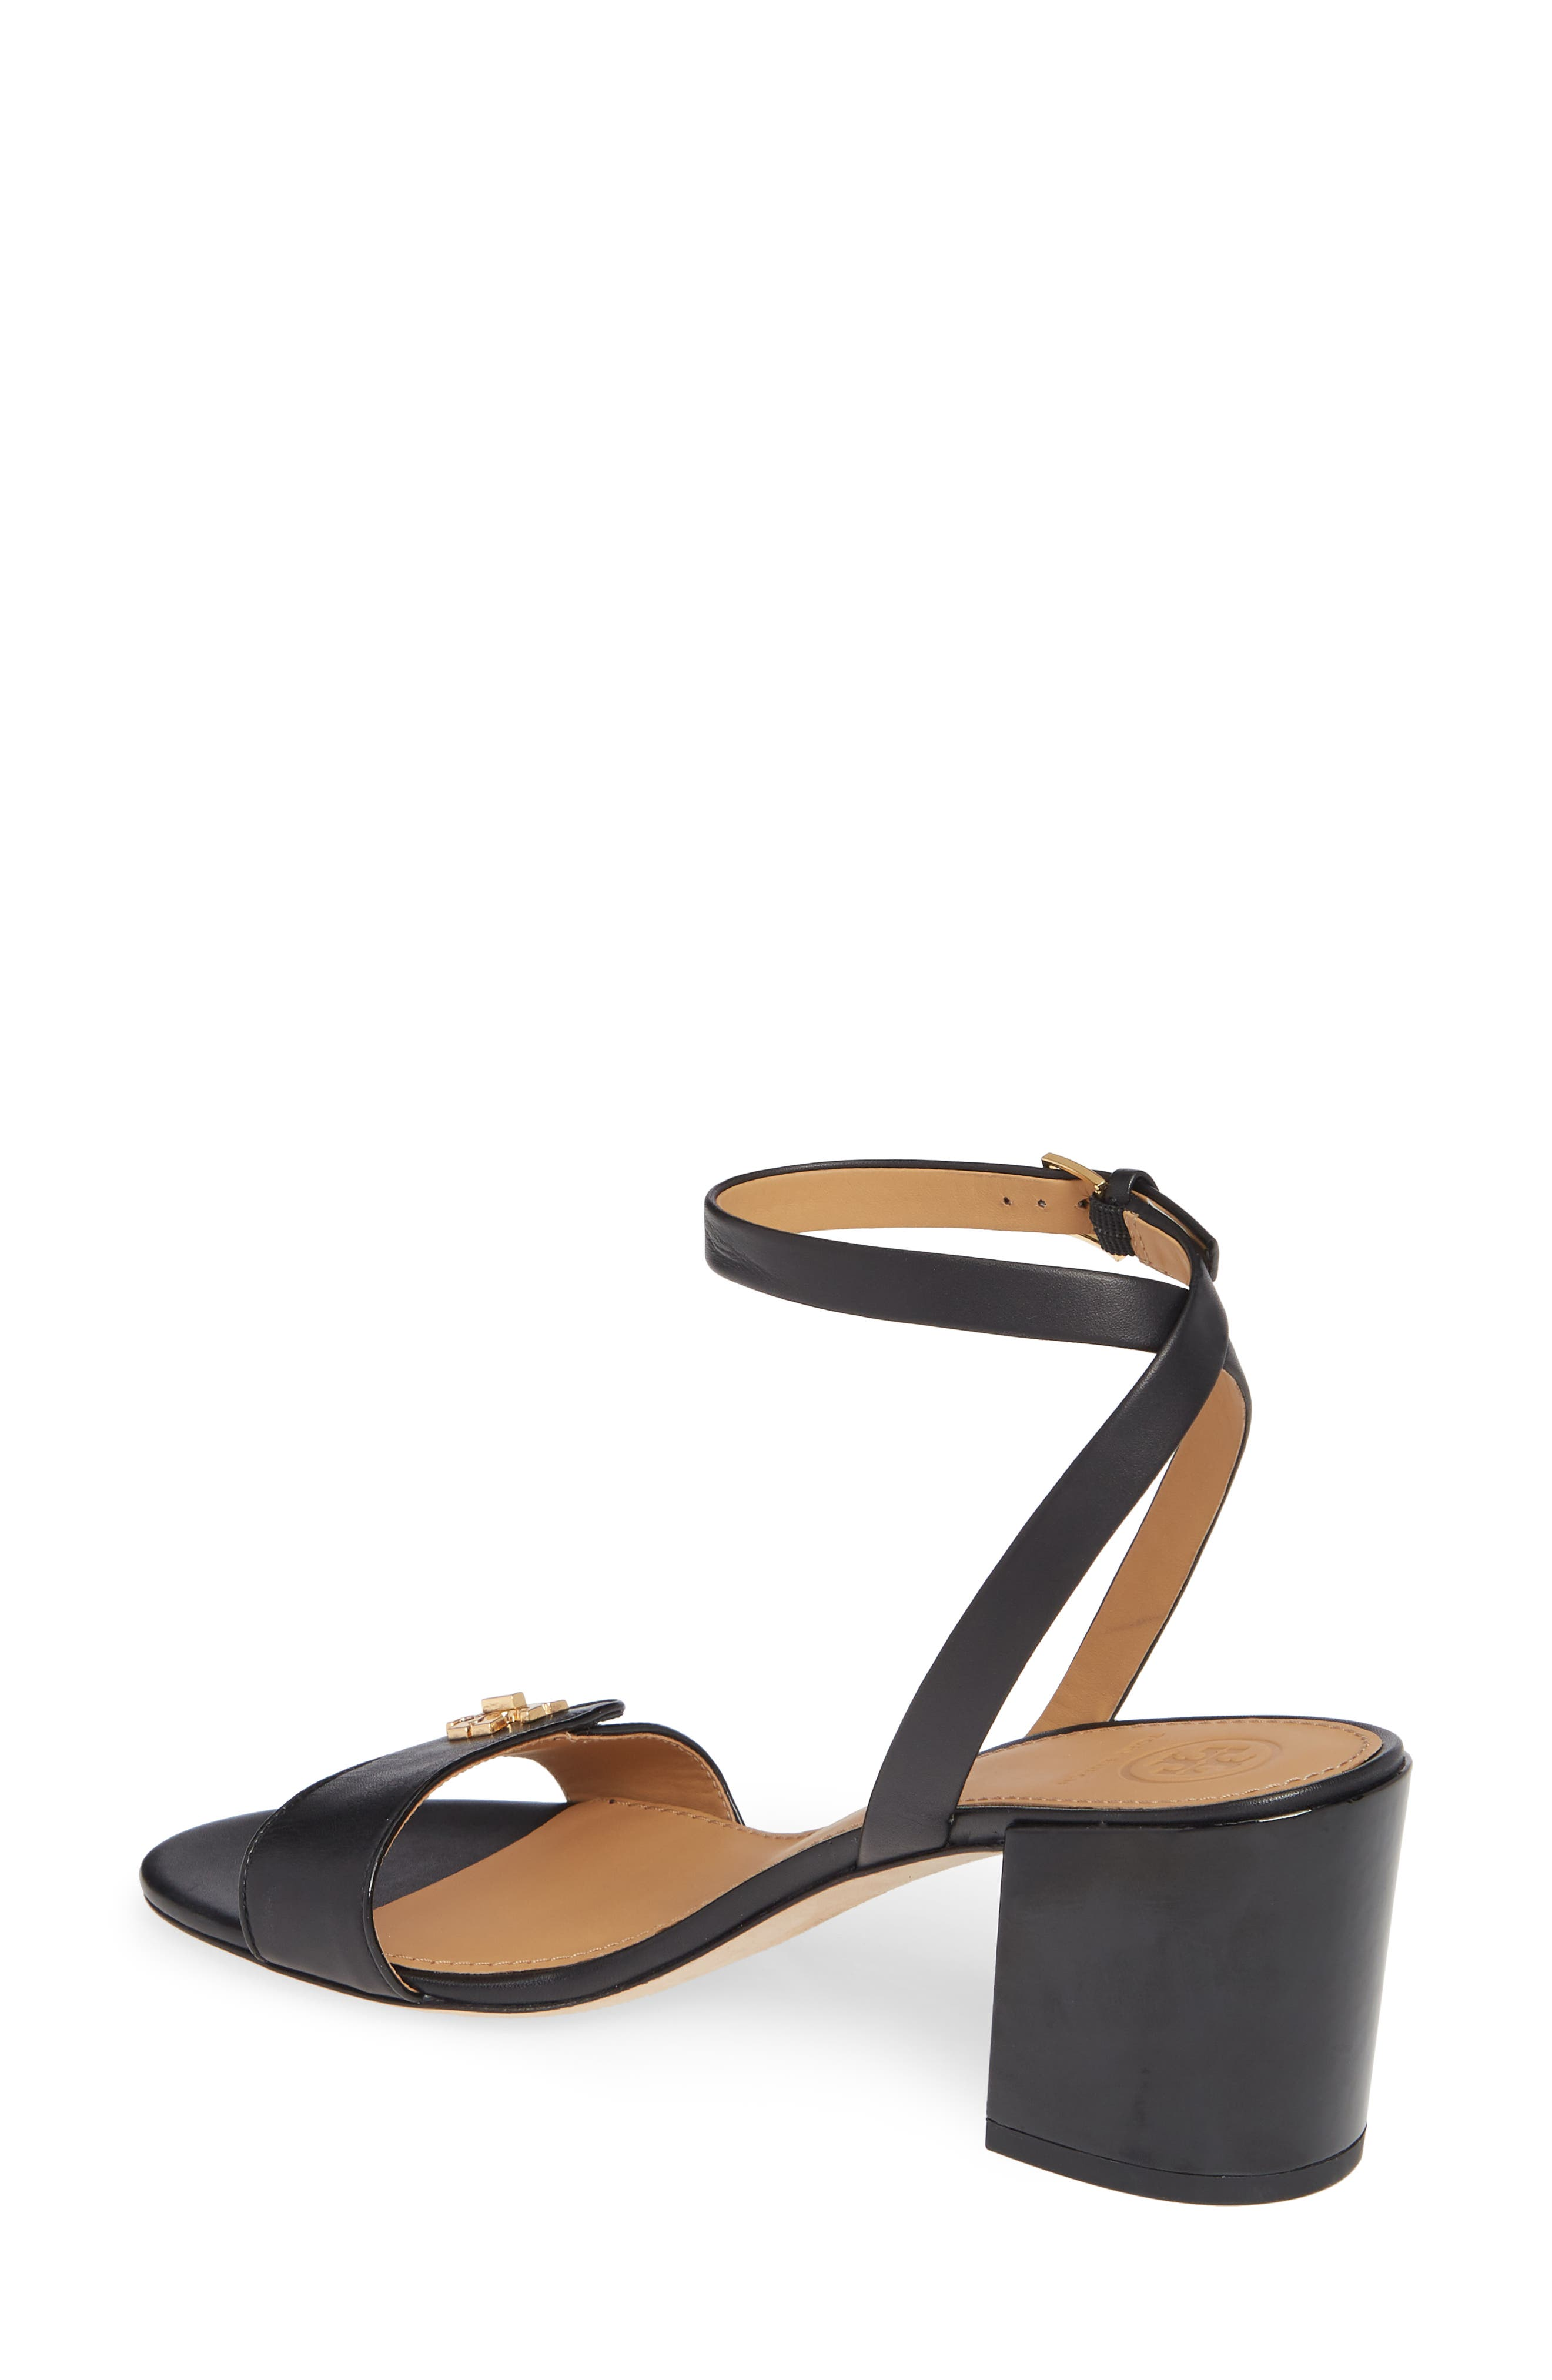 Kira Block Heel Sandal,                             Alternate thumbnail 2, color,                             PERFECT BLACK/ PERFECT BLACK